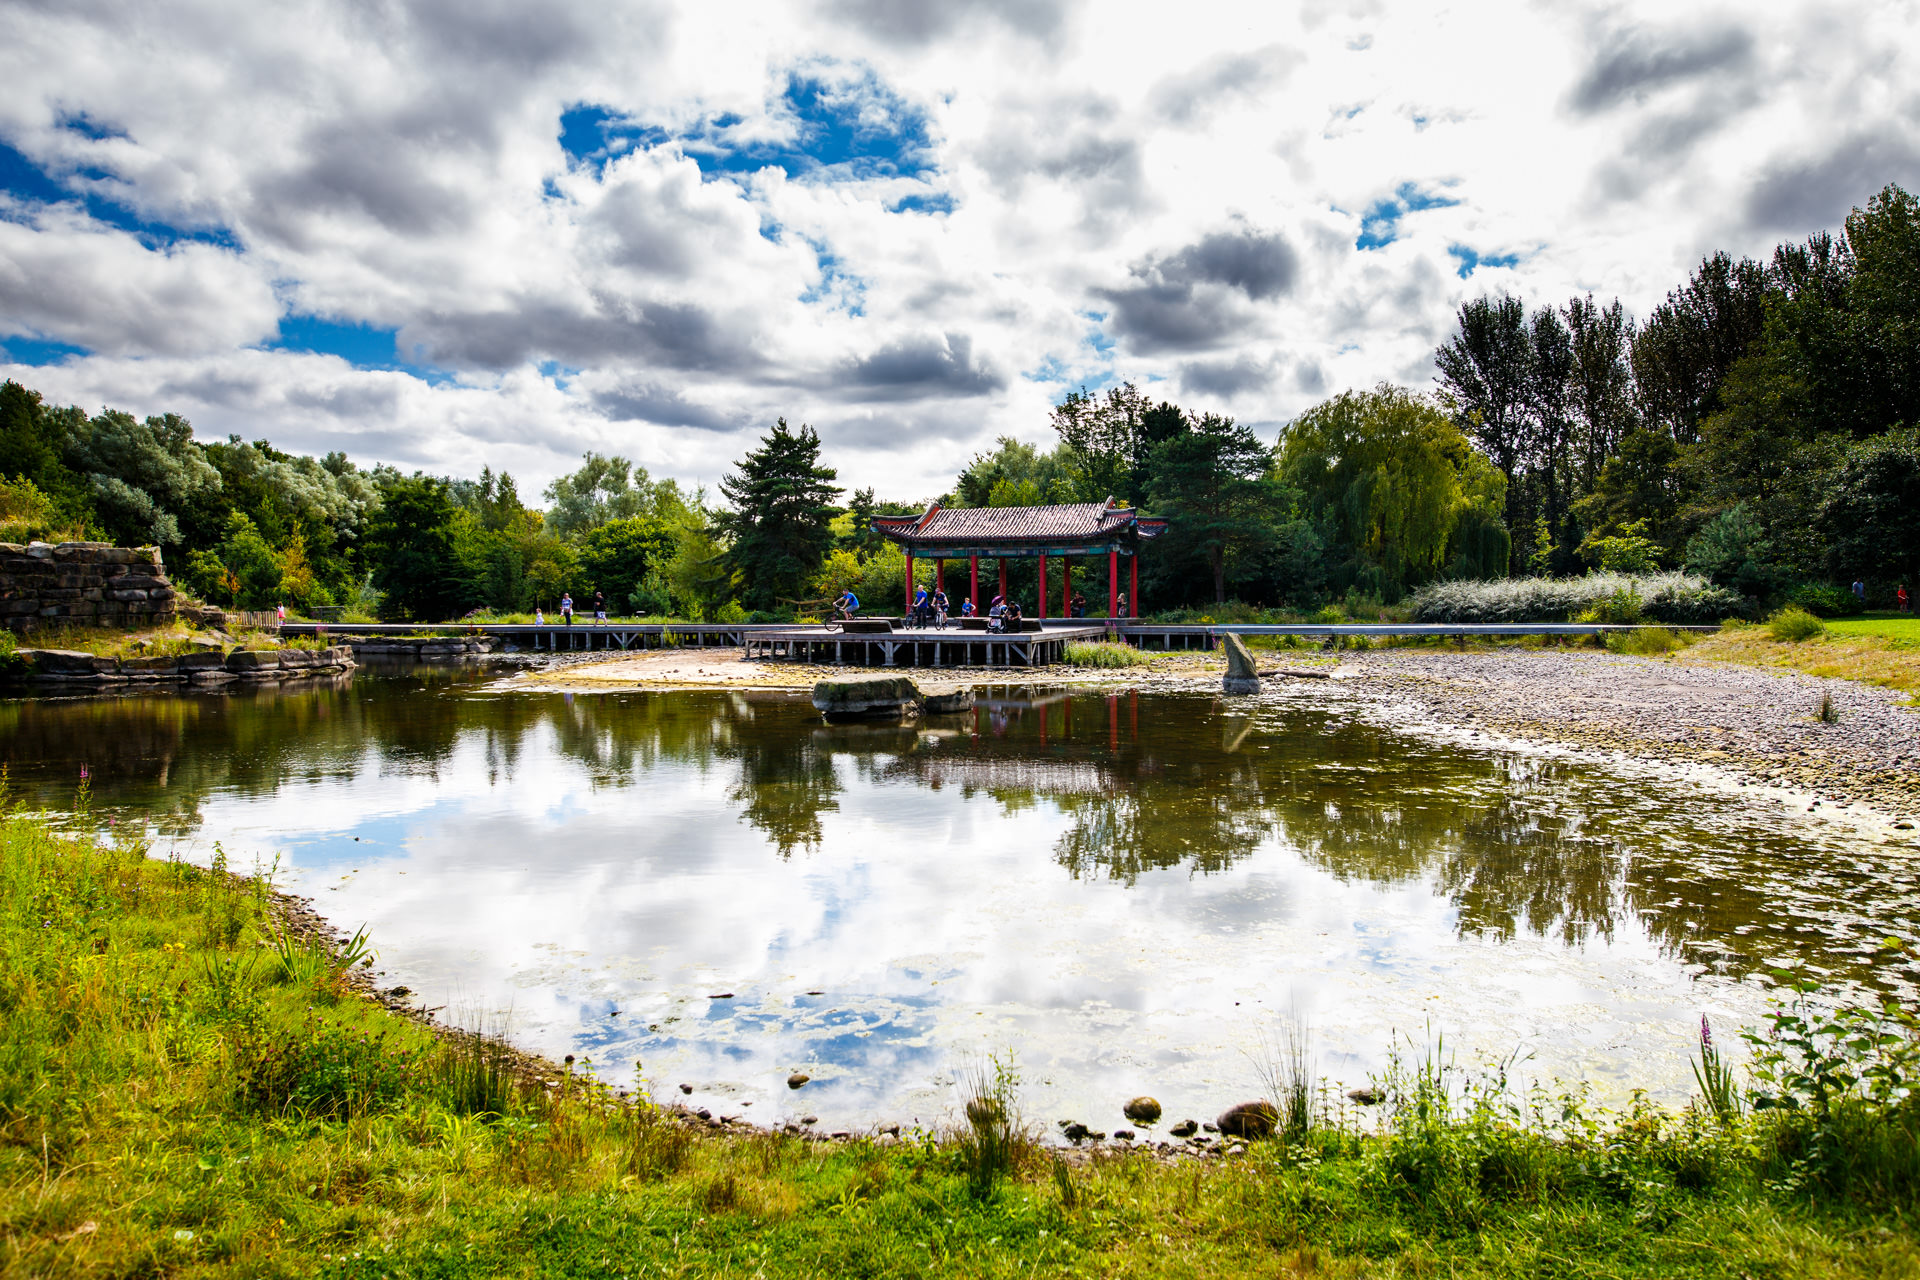 Andrew Wilson Photography Liverpool (20) Festival Gardens Chinese Pagoda Pond.jpg